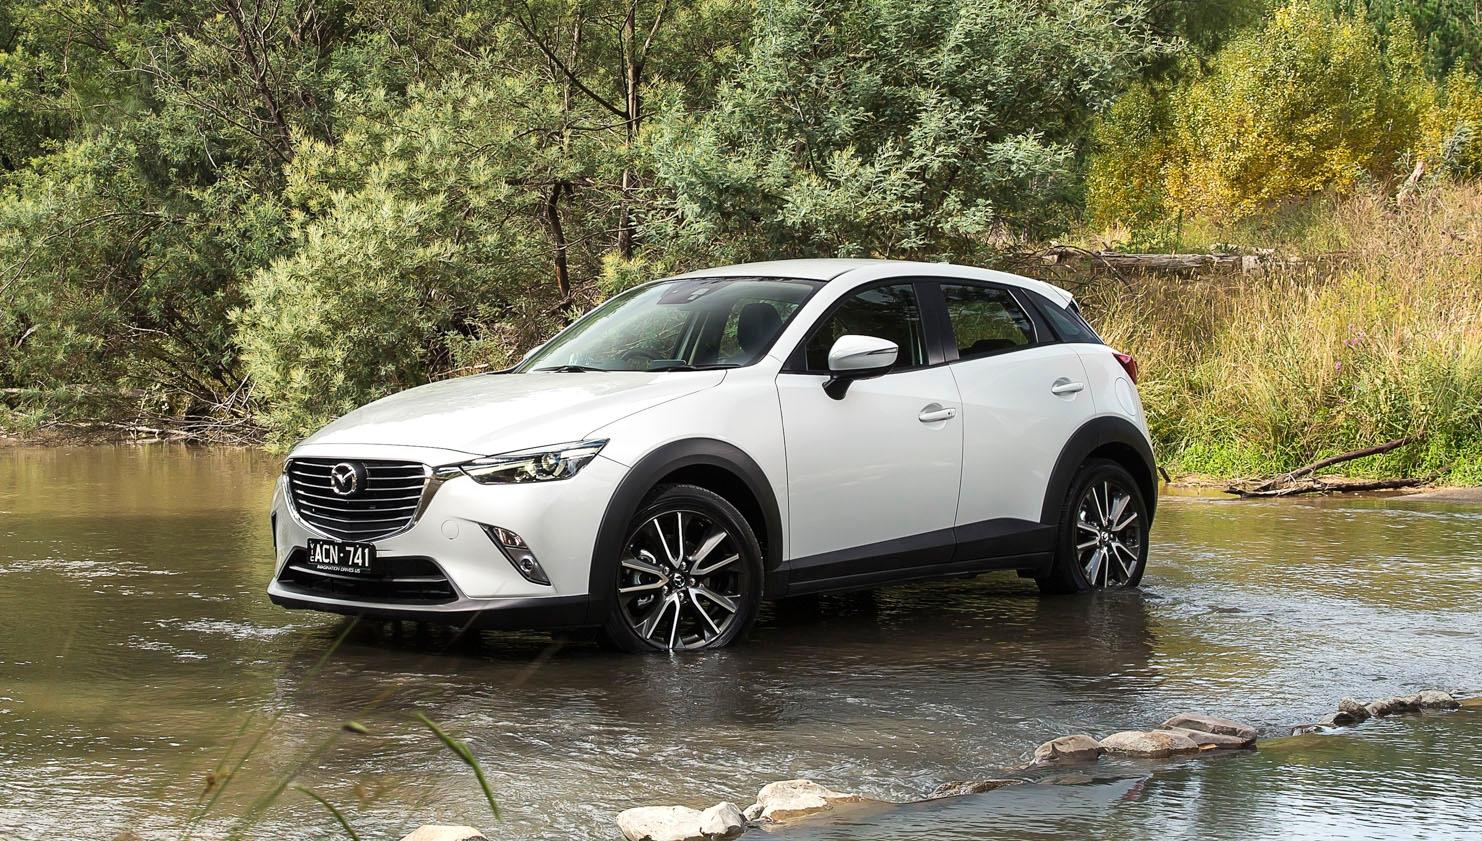 2017 mazda cx 3 grand touring review australia cars for you - Mazda Cx 3 Stouring Oz 10 Jpg 1482